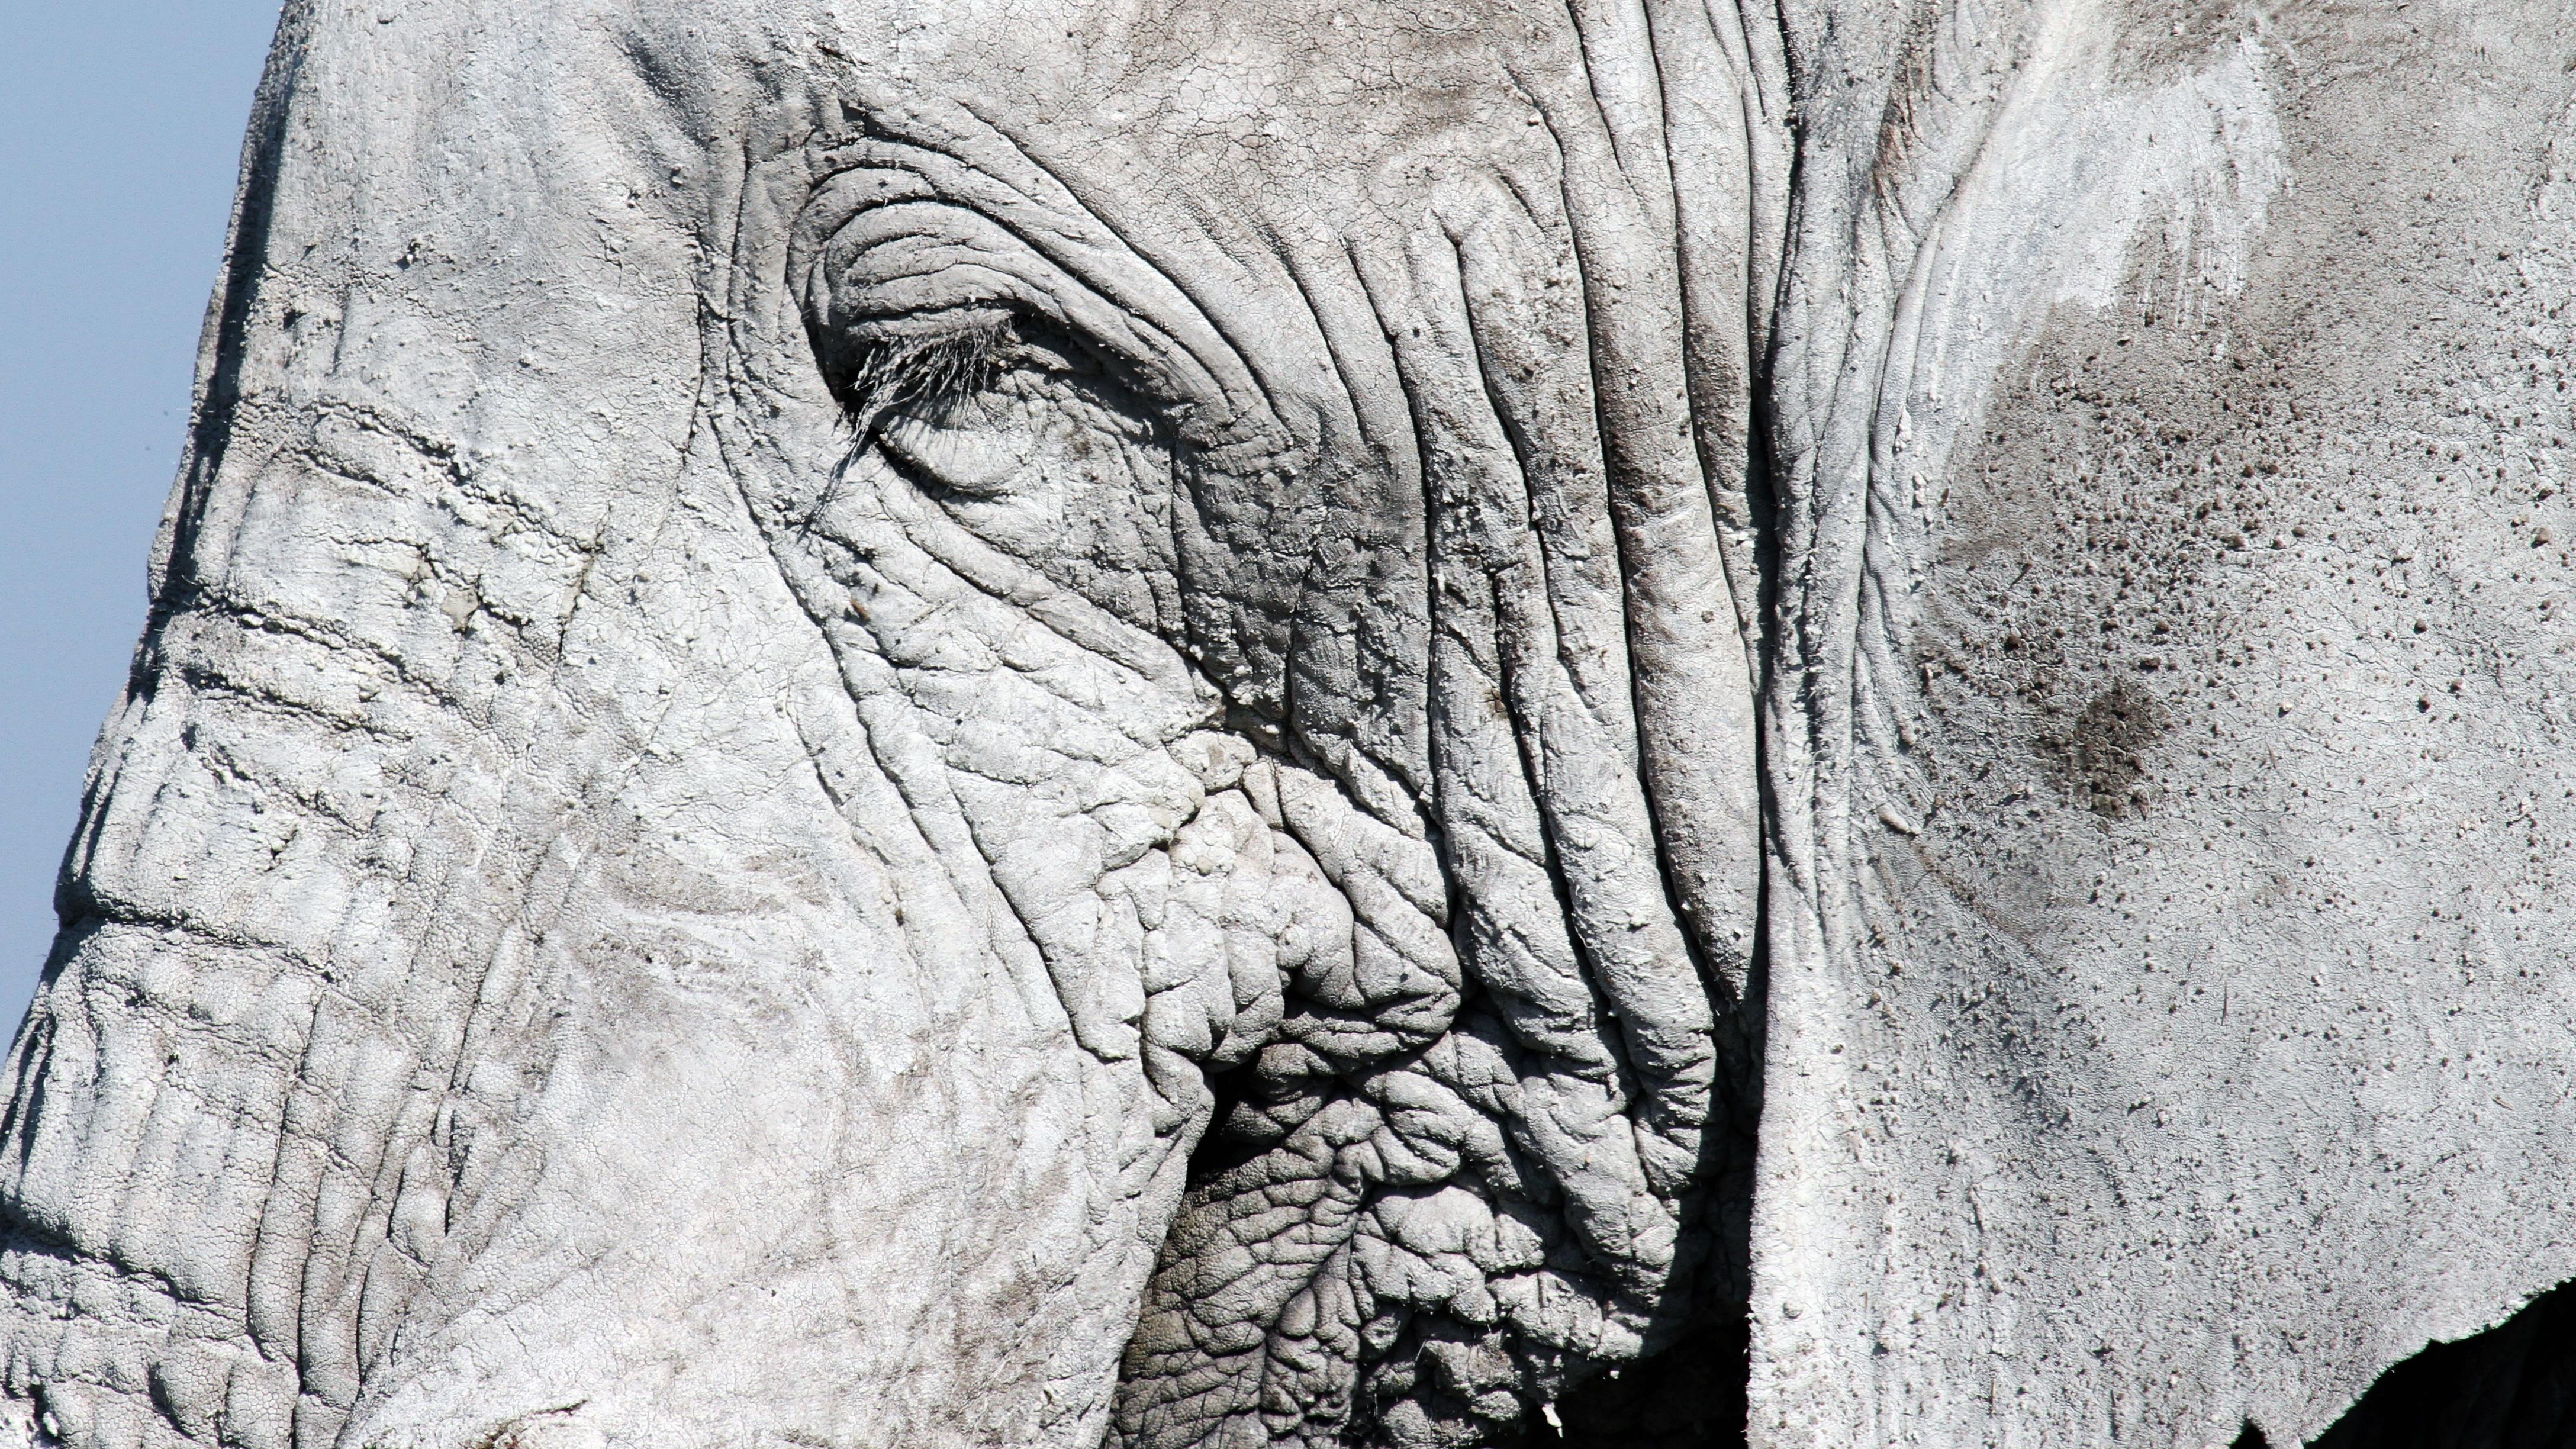 Free images rock wood statue monochrome elephant